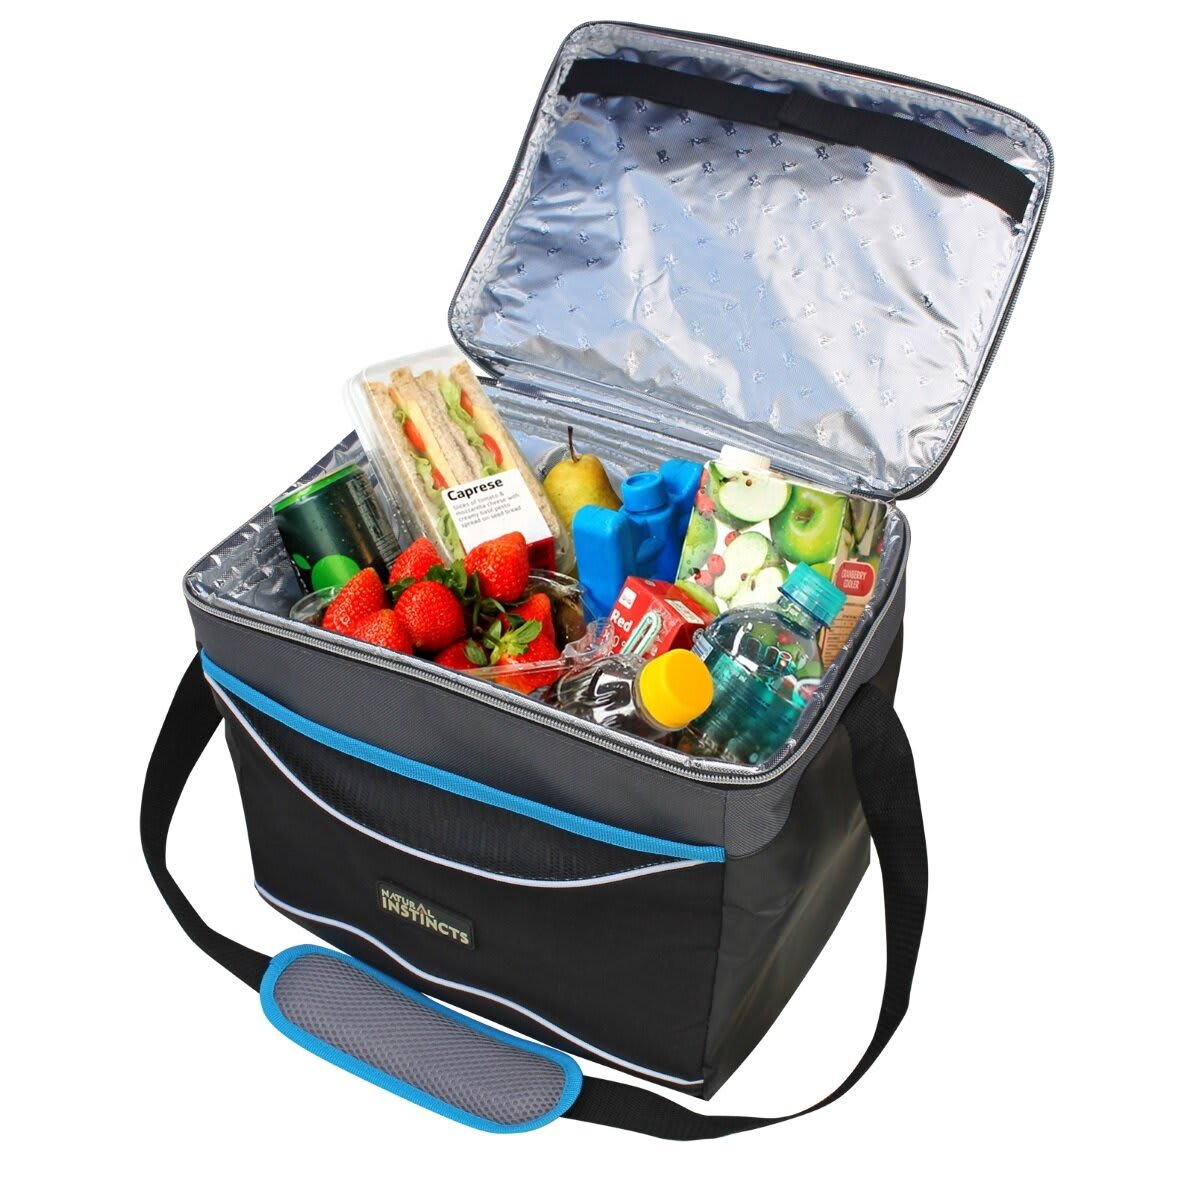 Natural Instinct 36 Can Soft Coolerbag